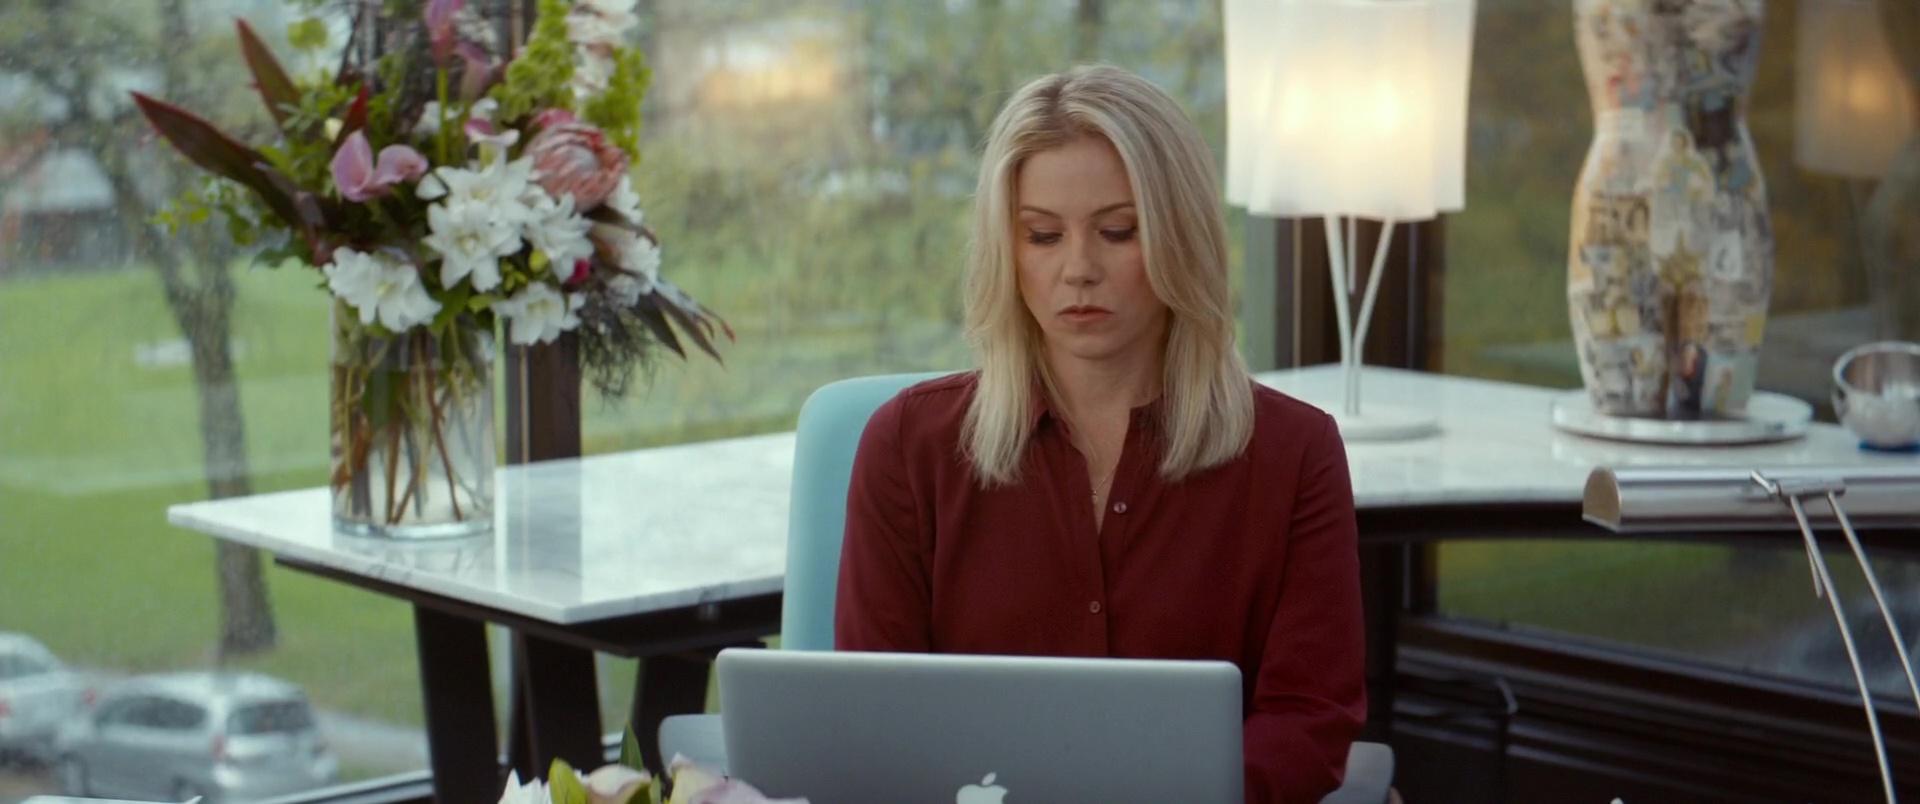 Apple Macbook Used By Christina Applegate In Crash Pad